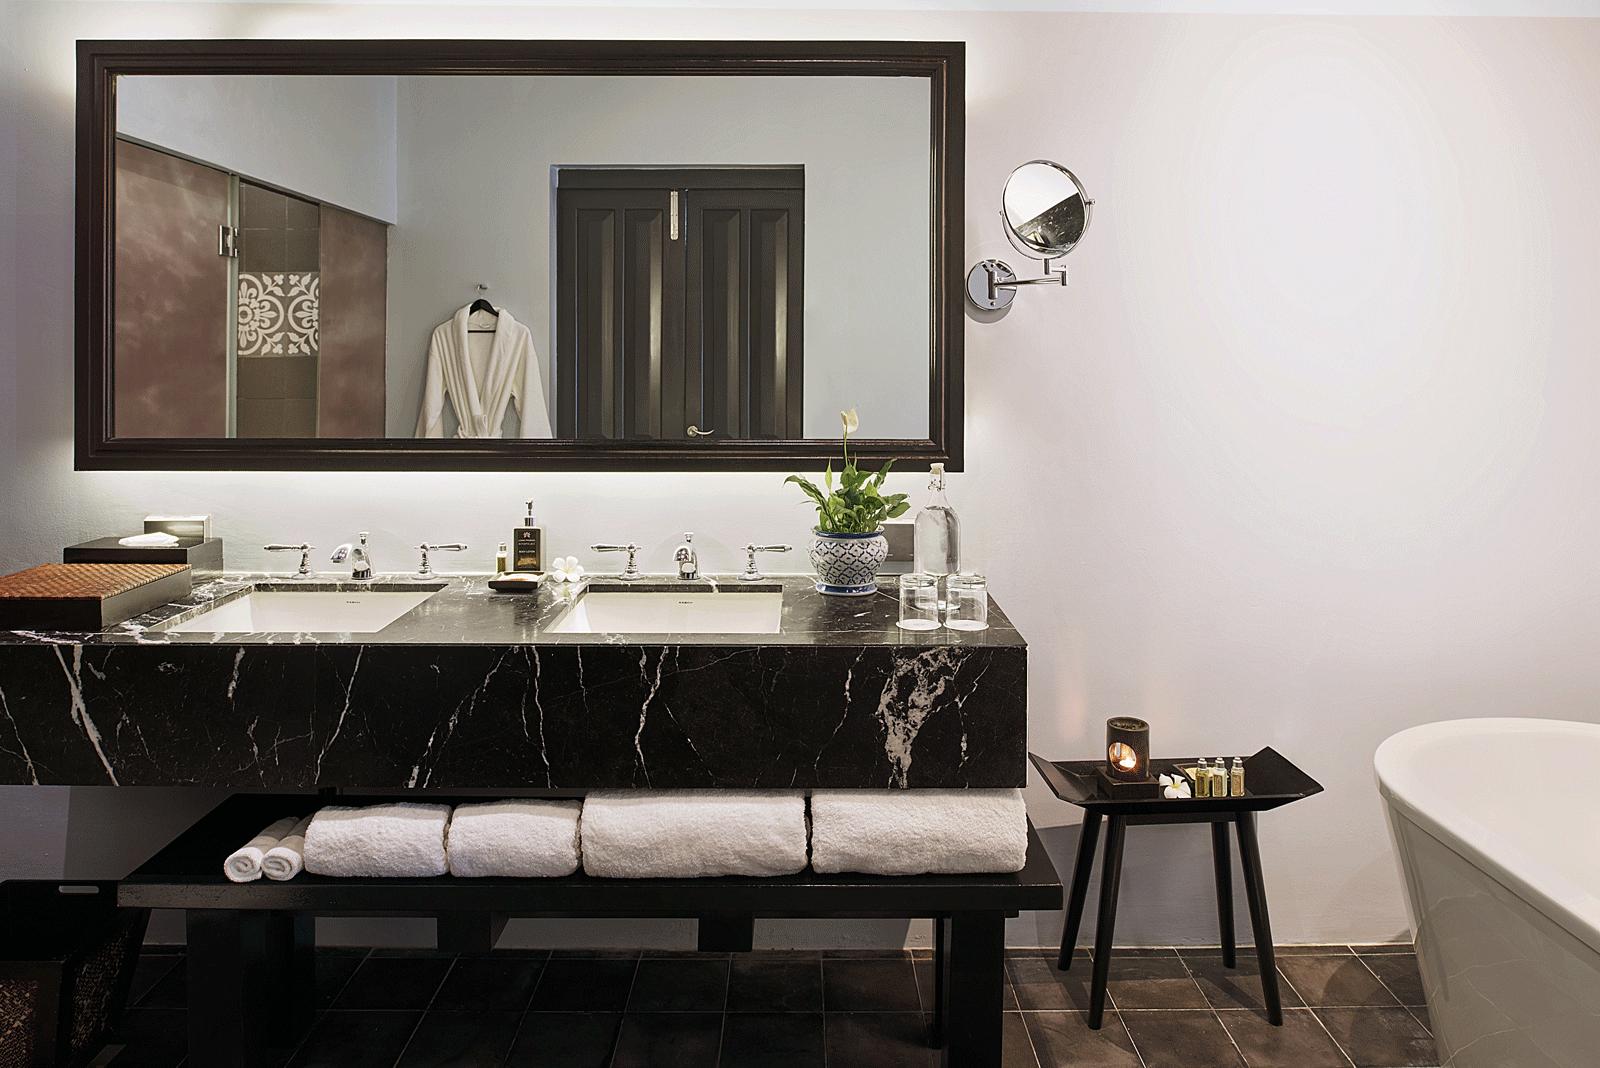 Sofitel-Luang-Prabang---Heritage-Suite-bathroom.png